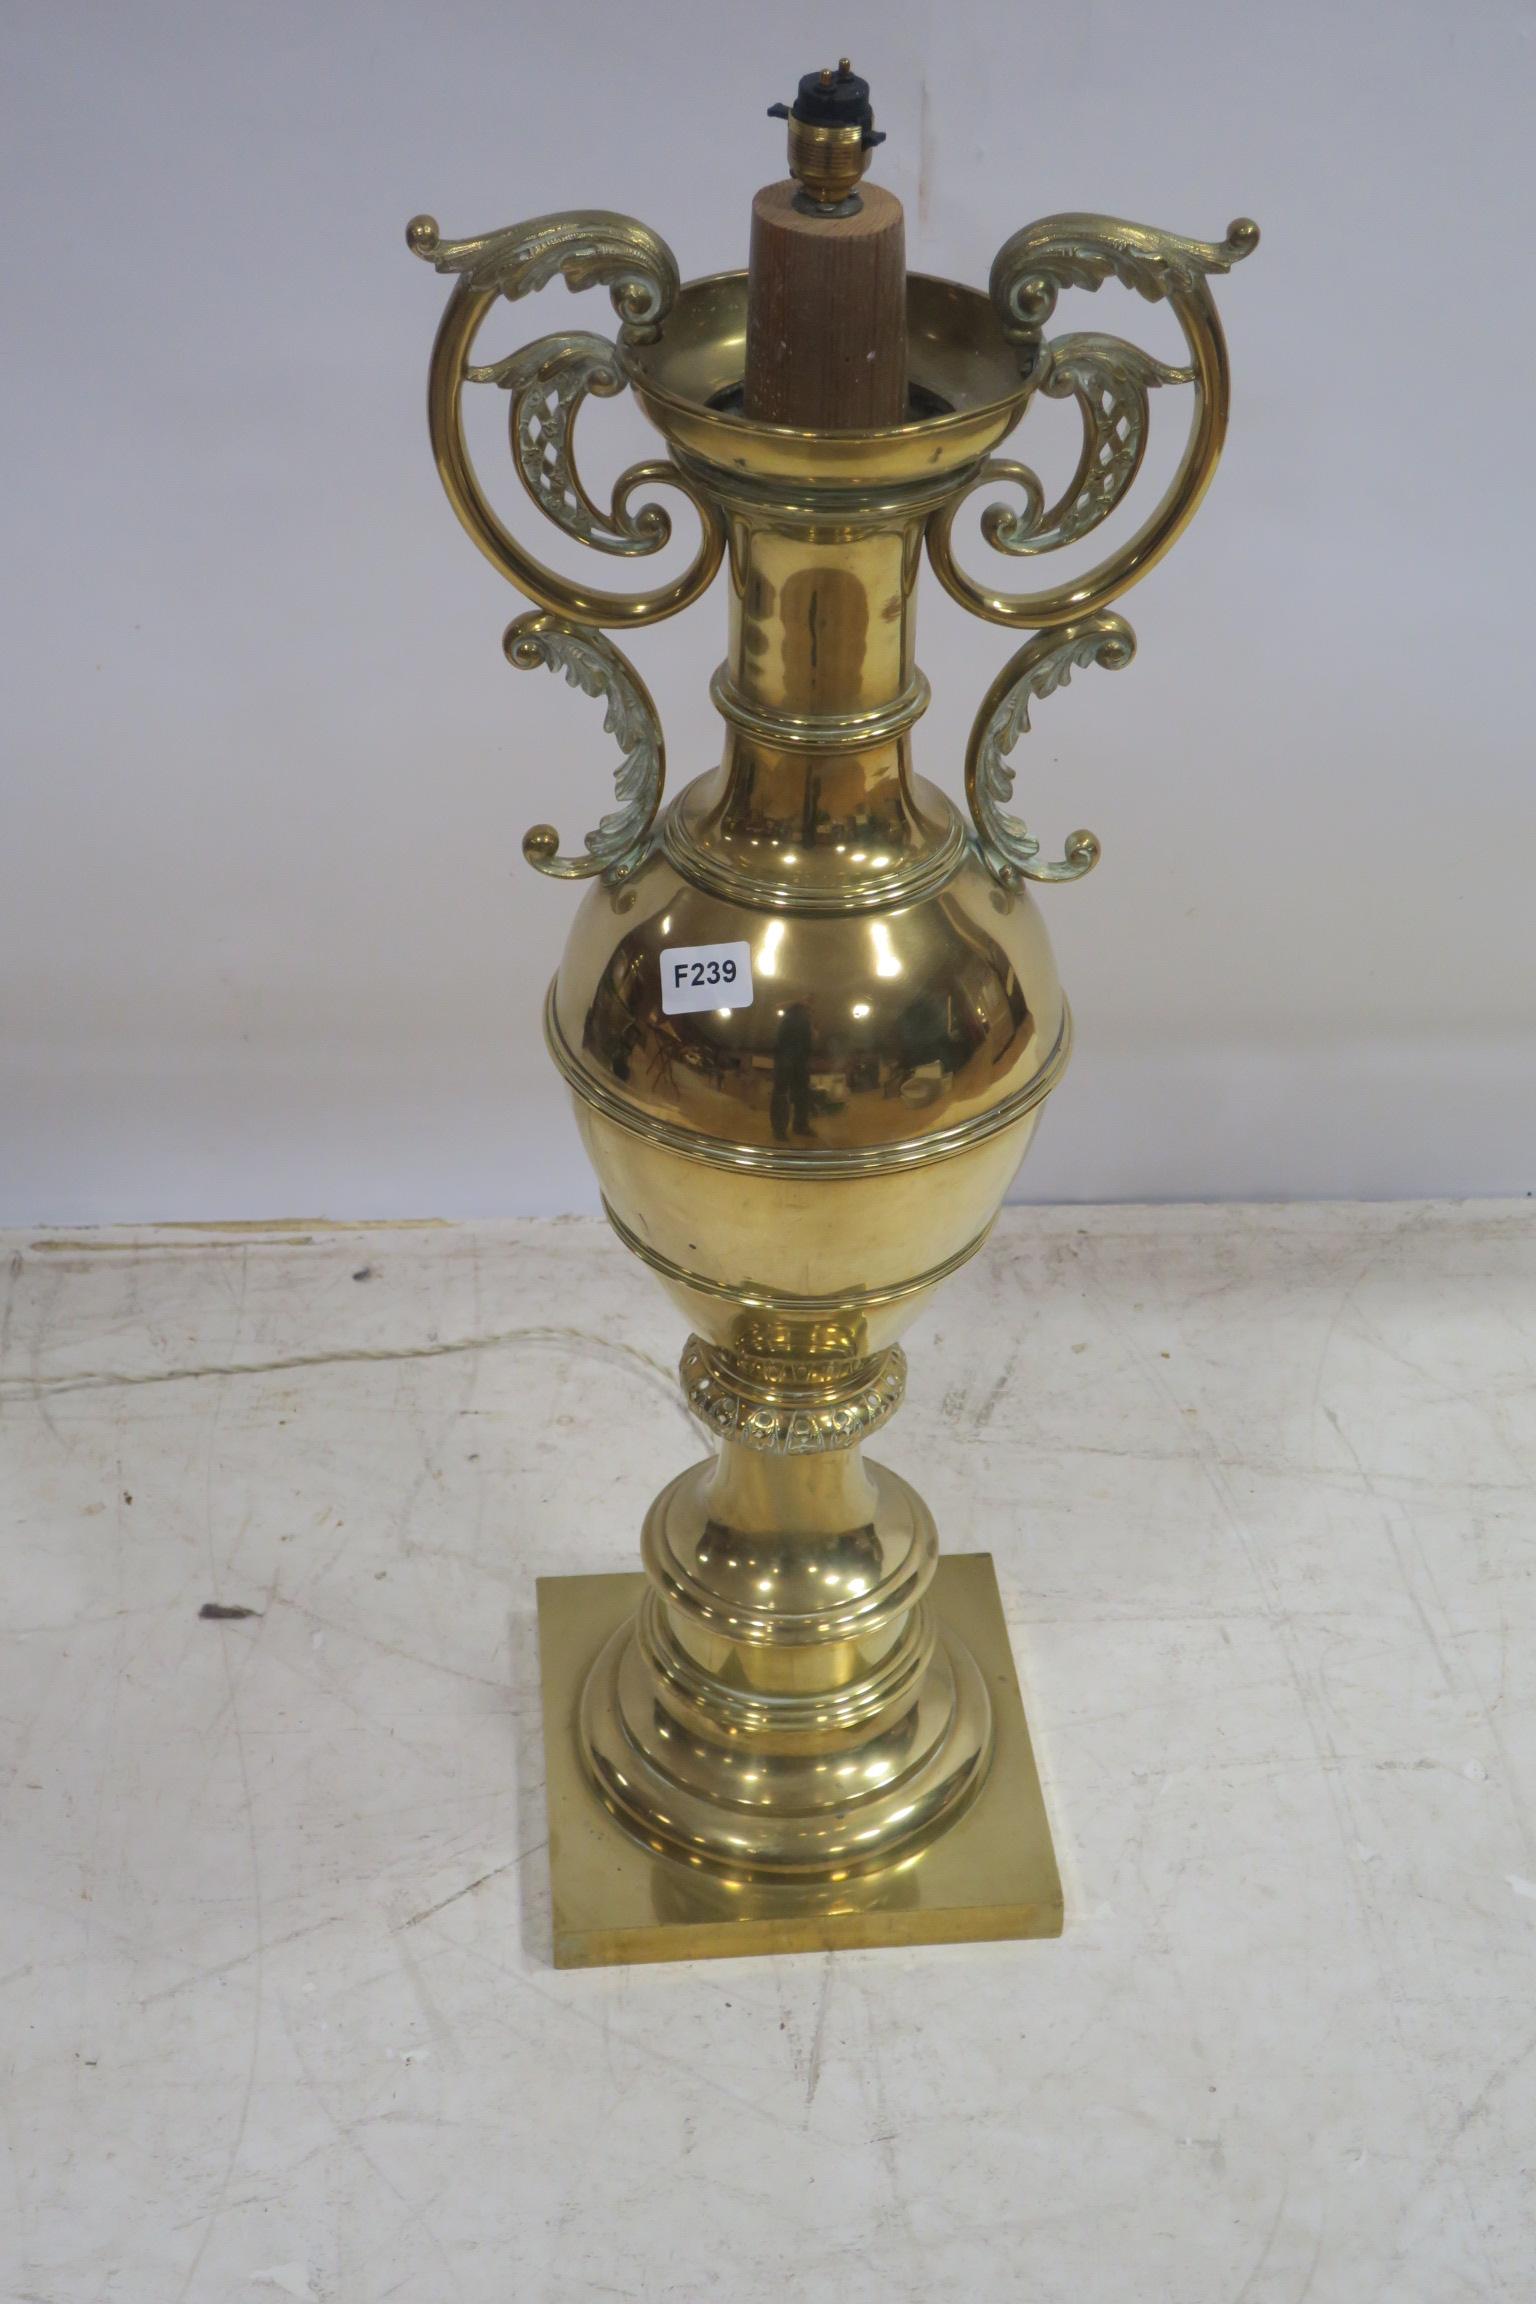 Lot 495 - A FINE BRASS TABLE LAMP,